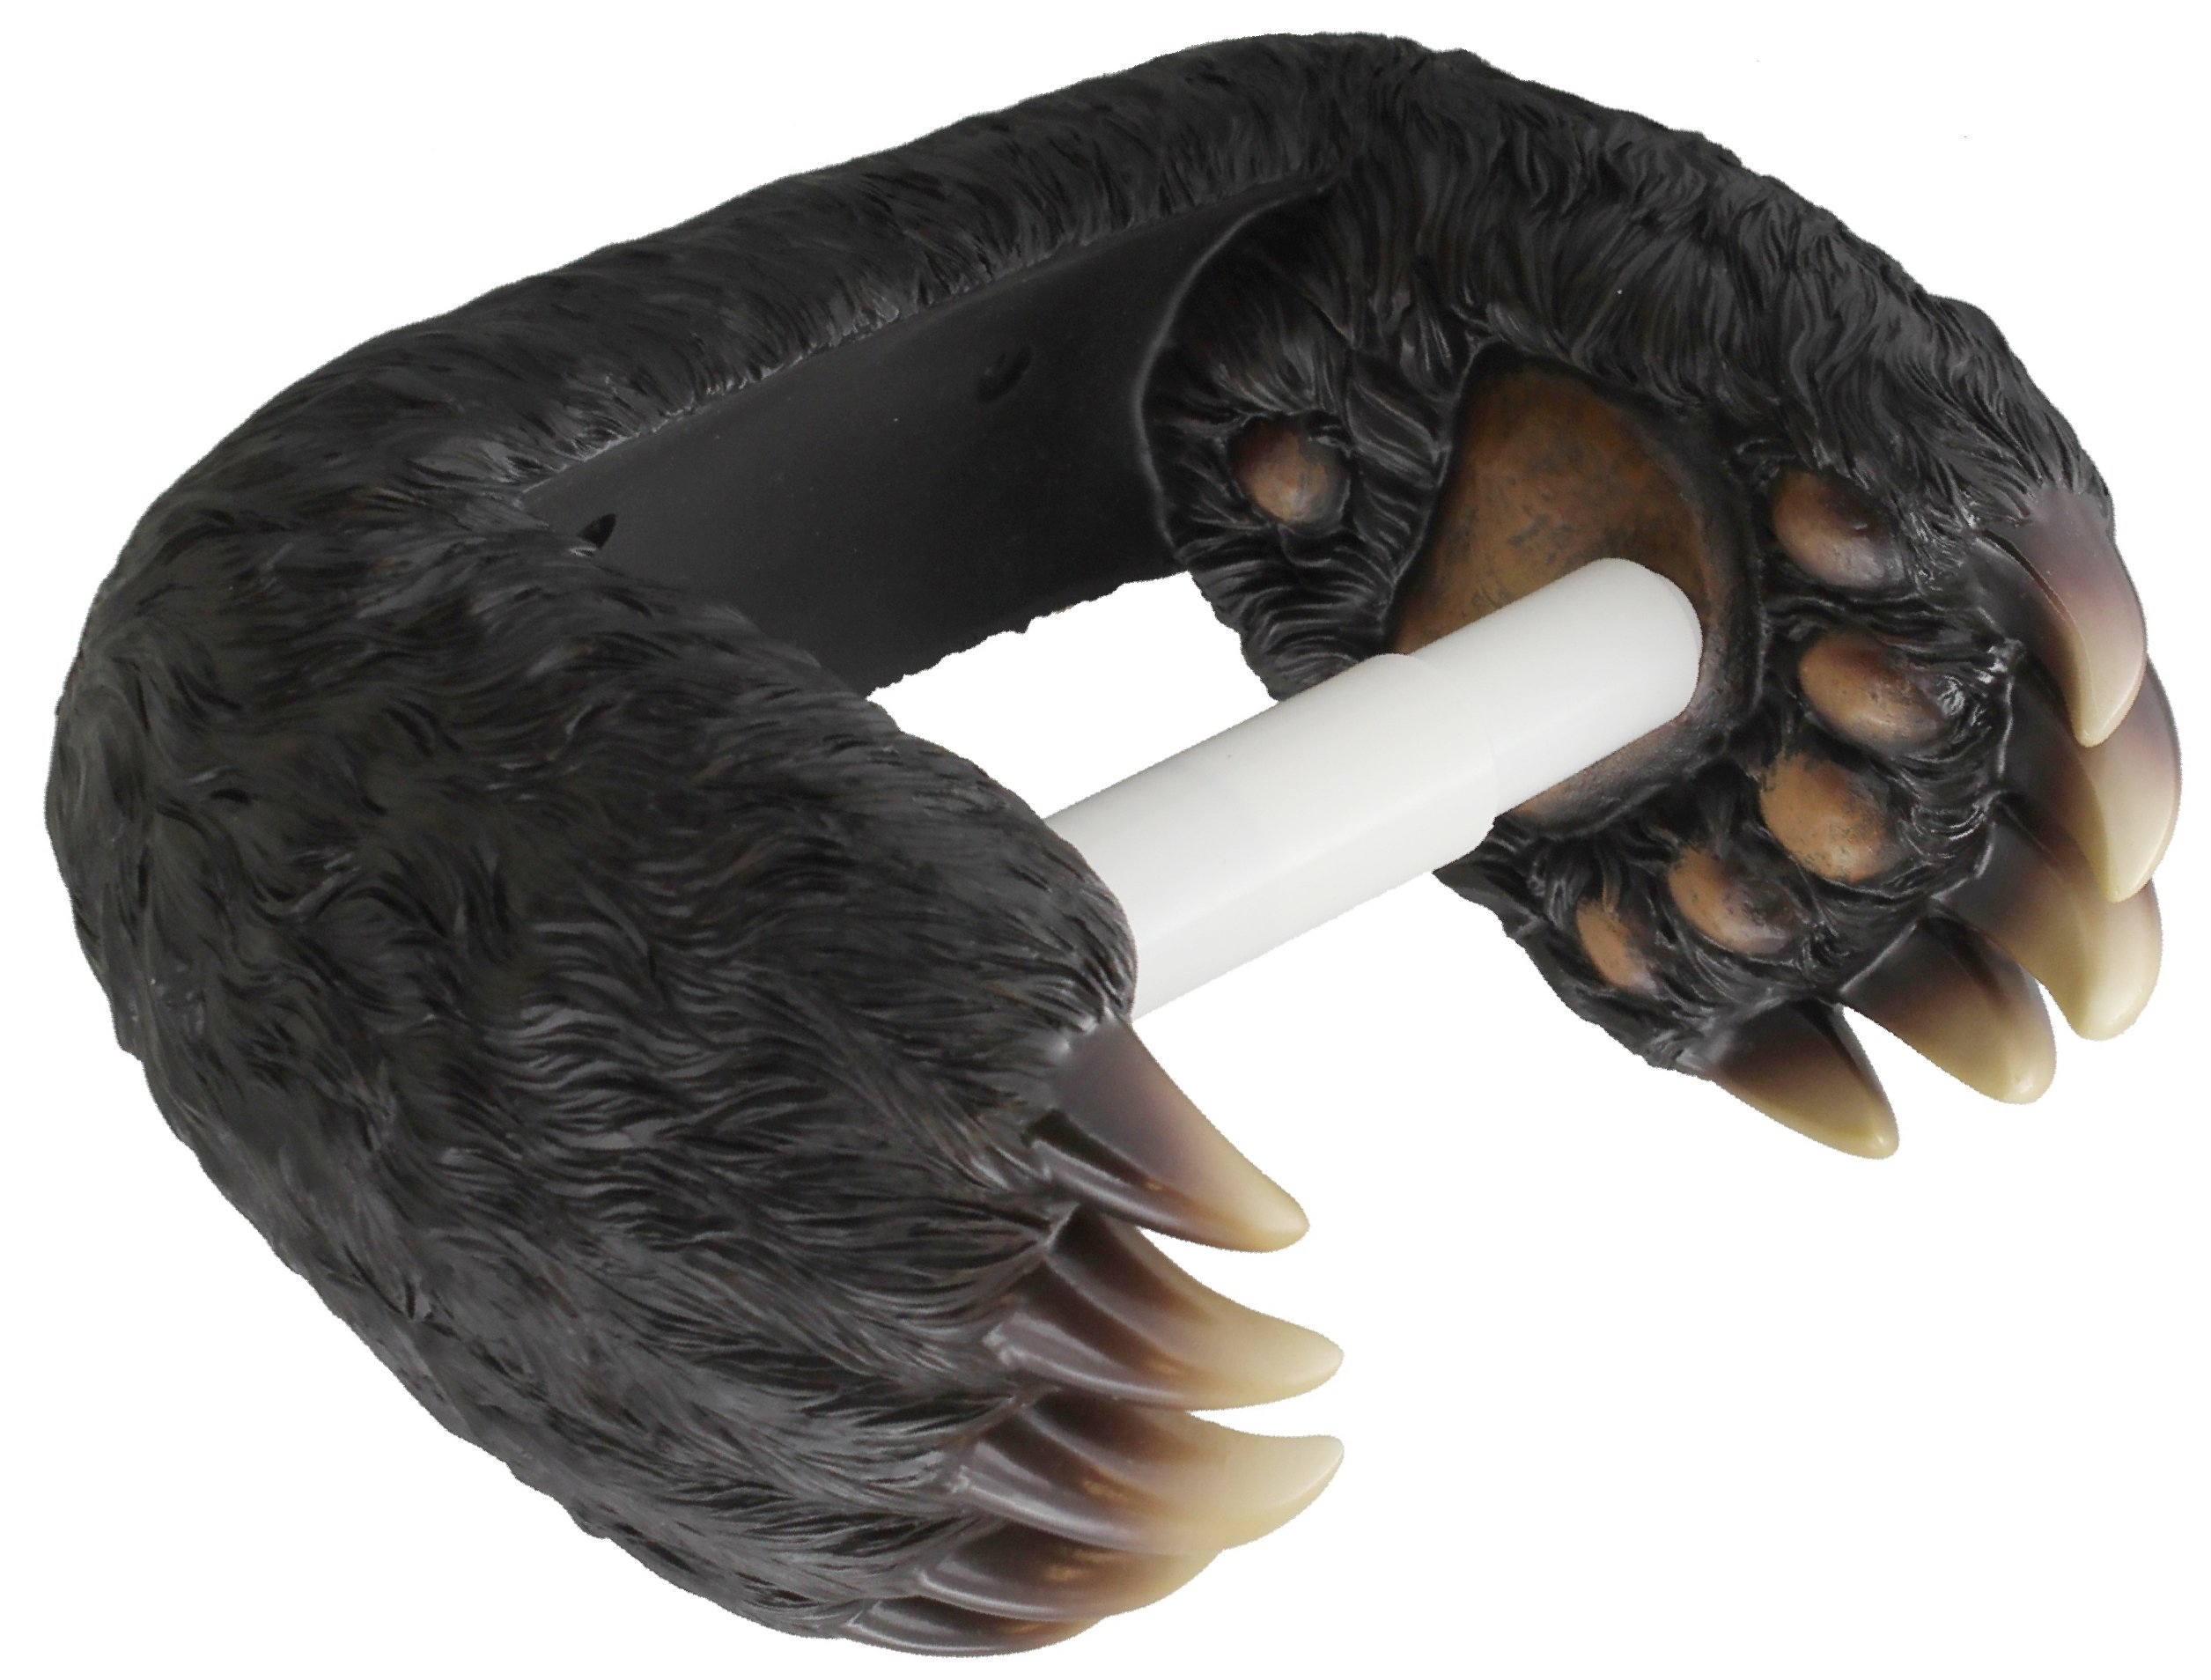 Bear Paw Toilet Paper Holder - Decorative Black Bear Claw Decor